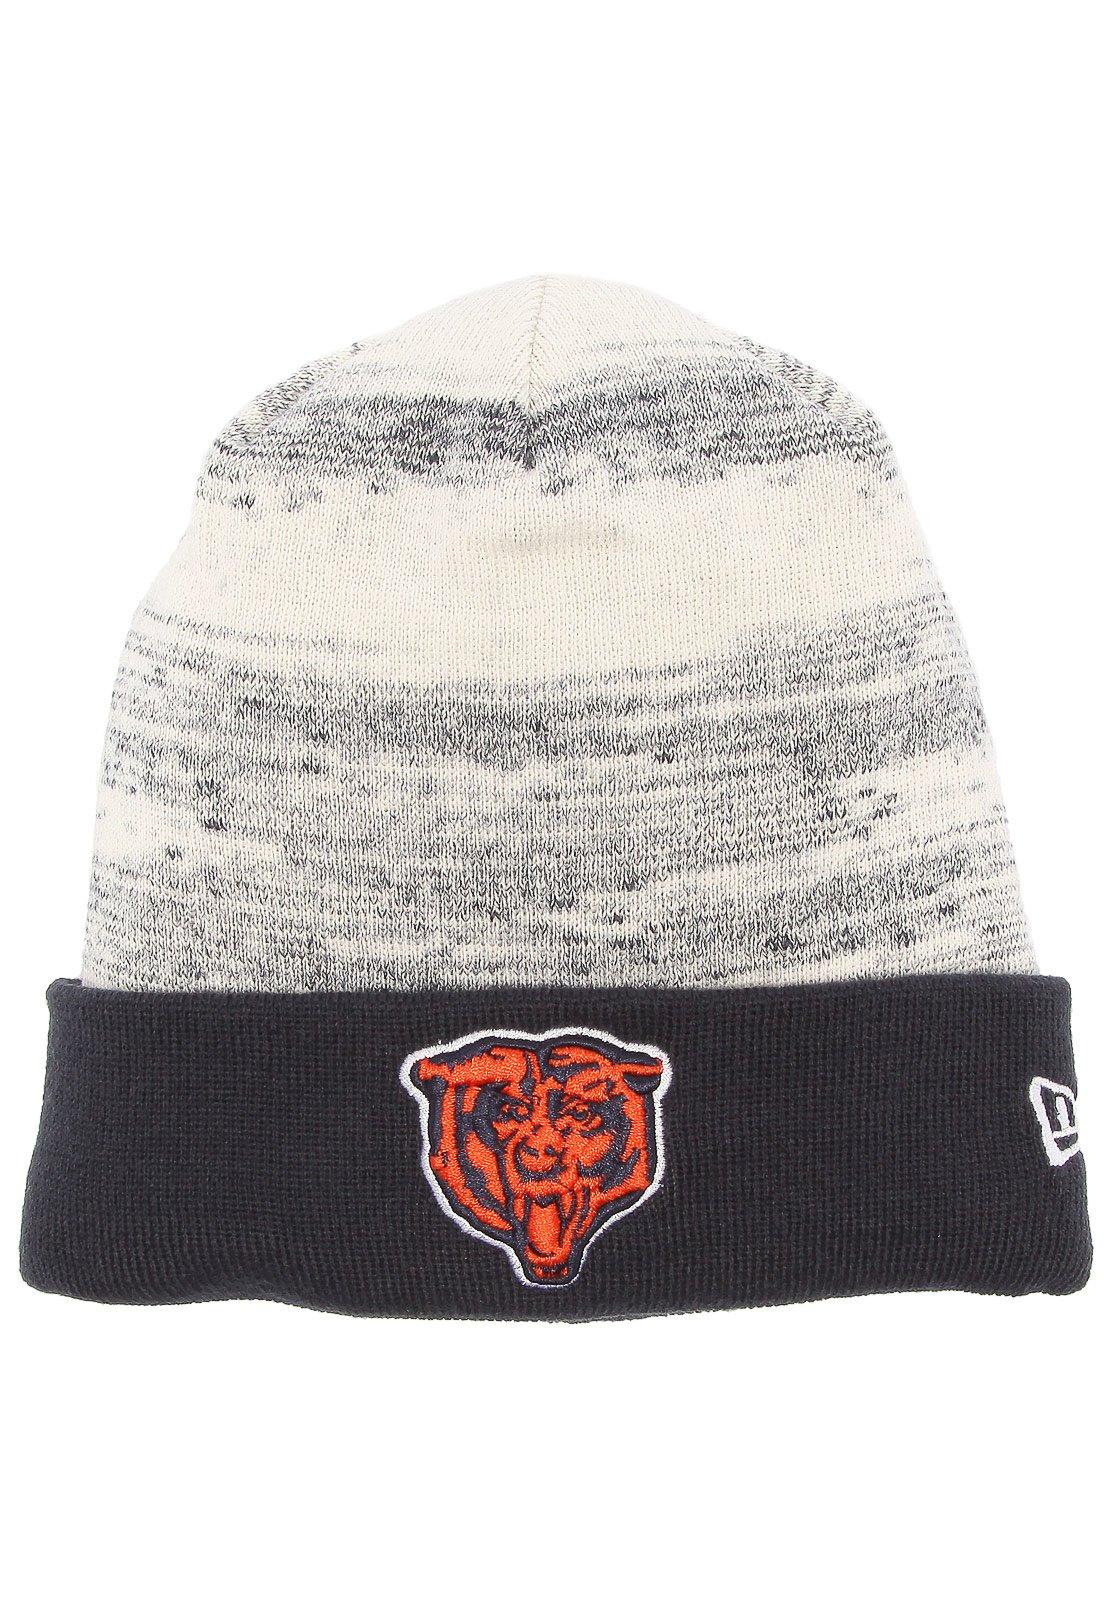 Gorro New Era Chicago Bears Cinza Azul - Marca New Era ... 809c53851d1